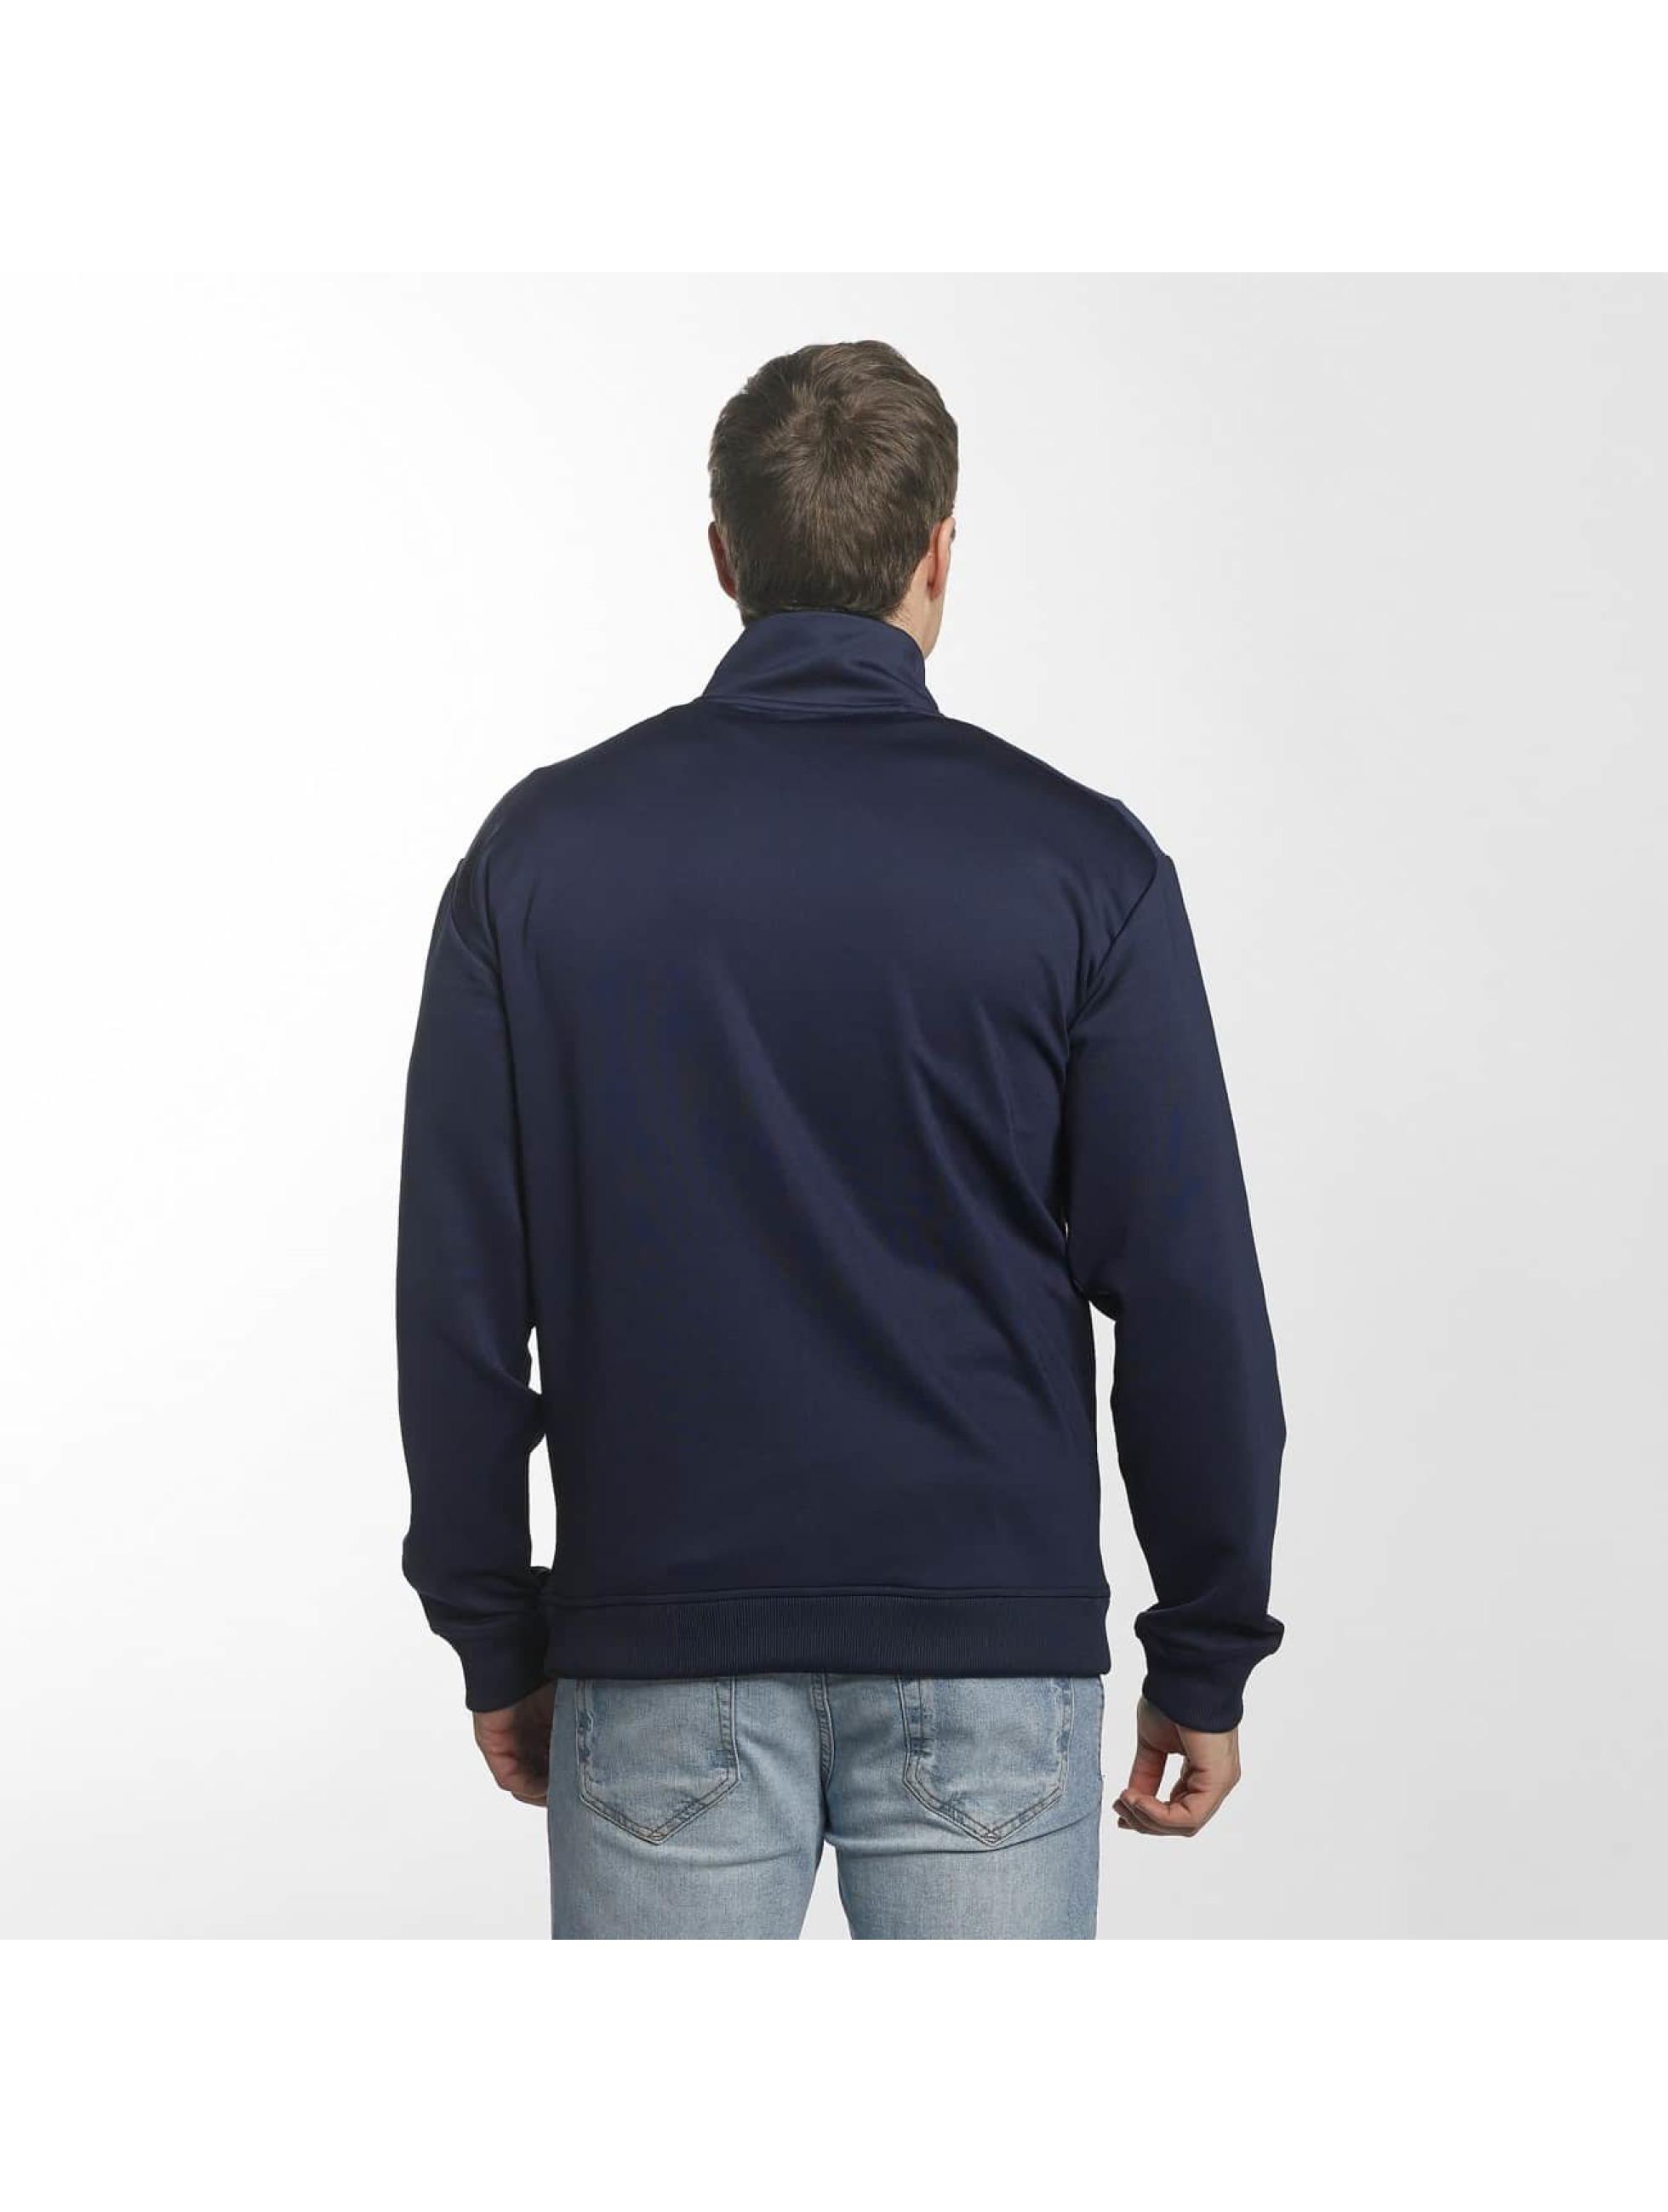 New Balance Lightweight Jacket MJ81551 Athletics blue